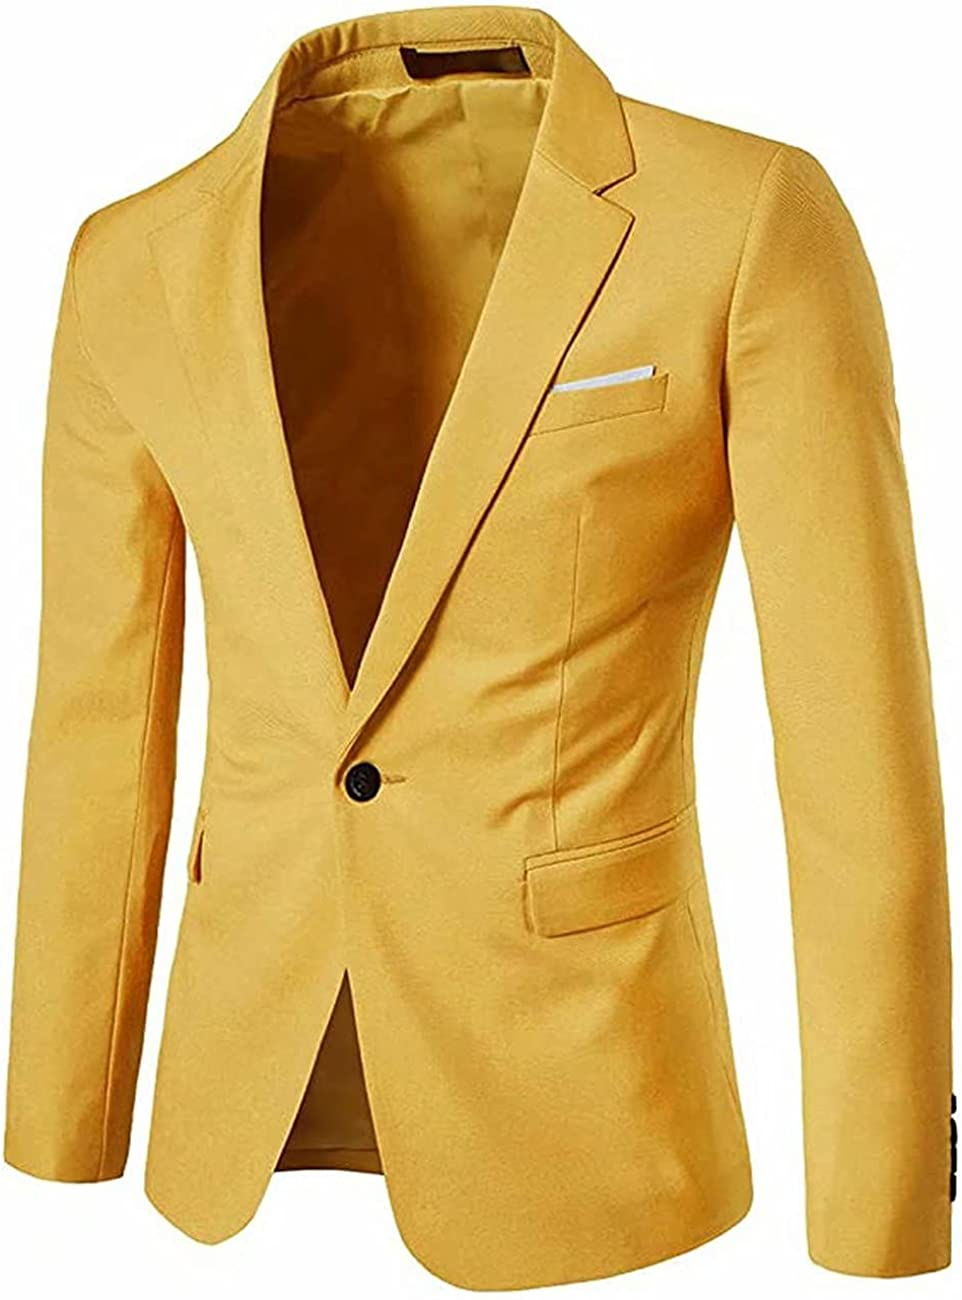 1 Pcs Men's Formal Jacket,One Button Slim Fit Blazer Sport Coat for Business Daily